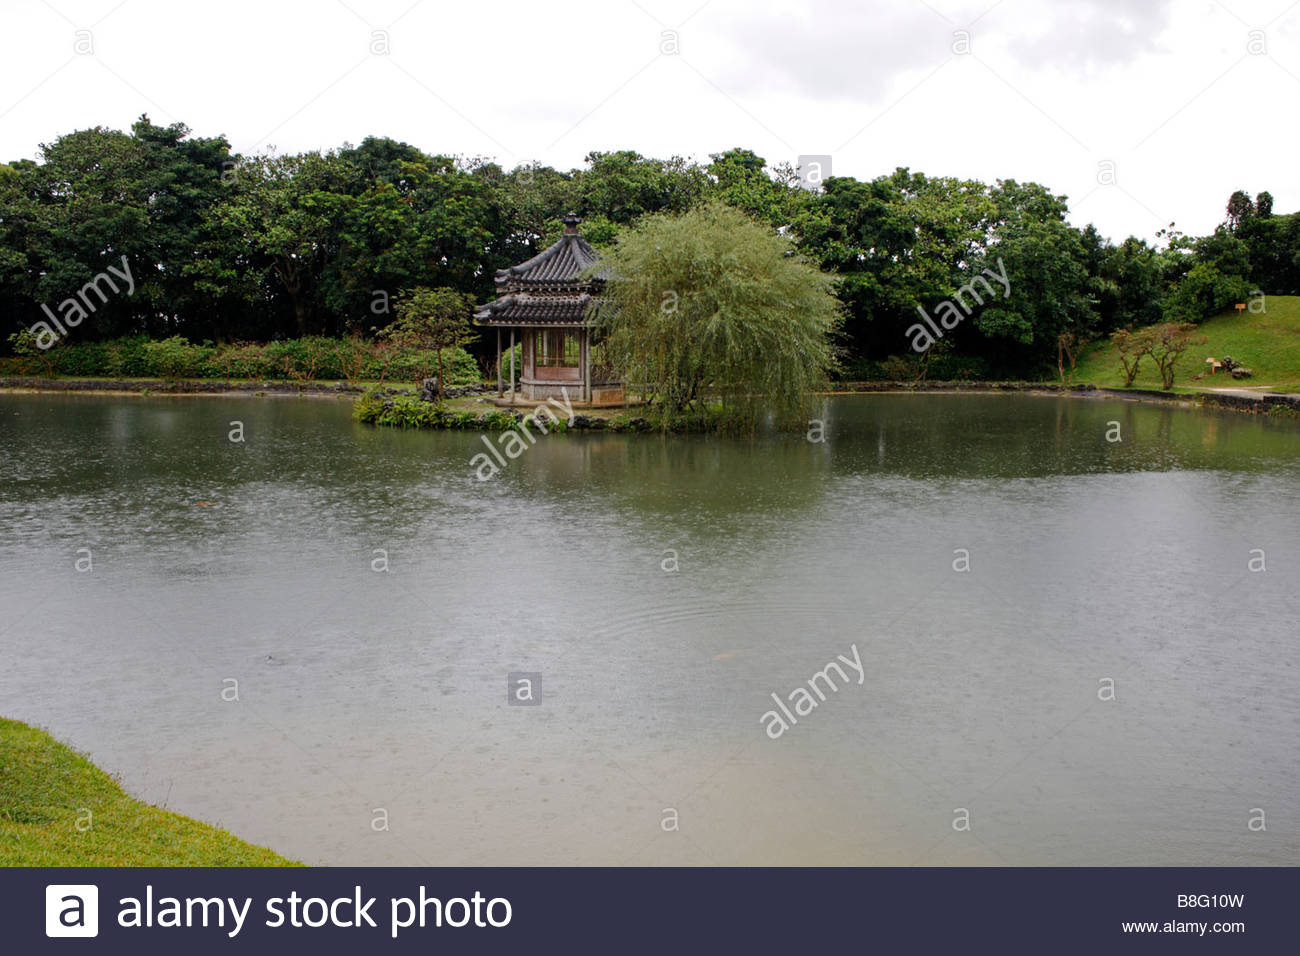 The Rokkaku-do pavilion of Shikina-En palace, Okinawa, Japan - Stock Image